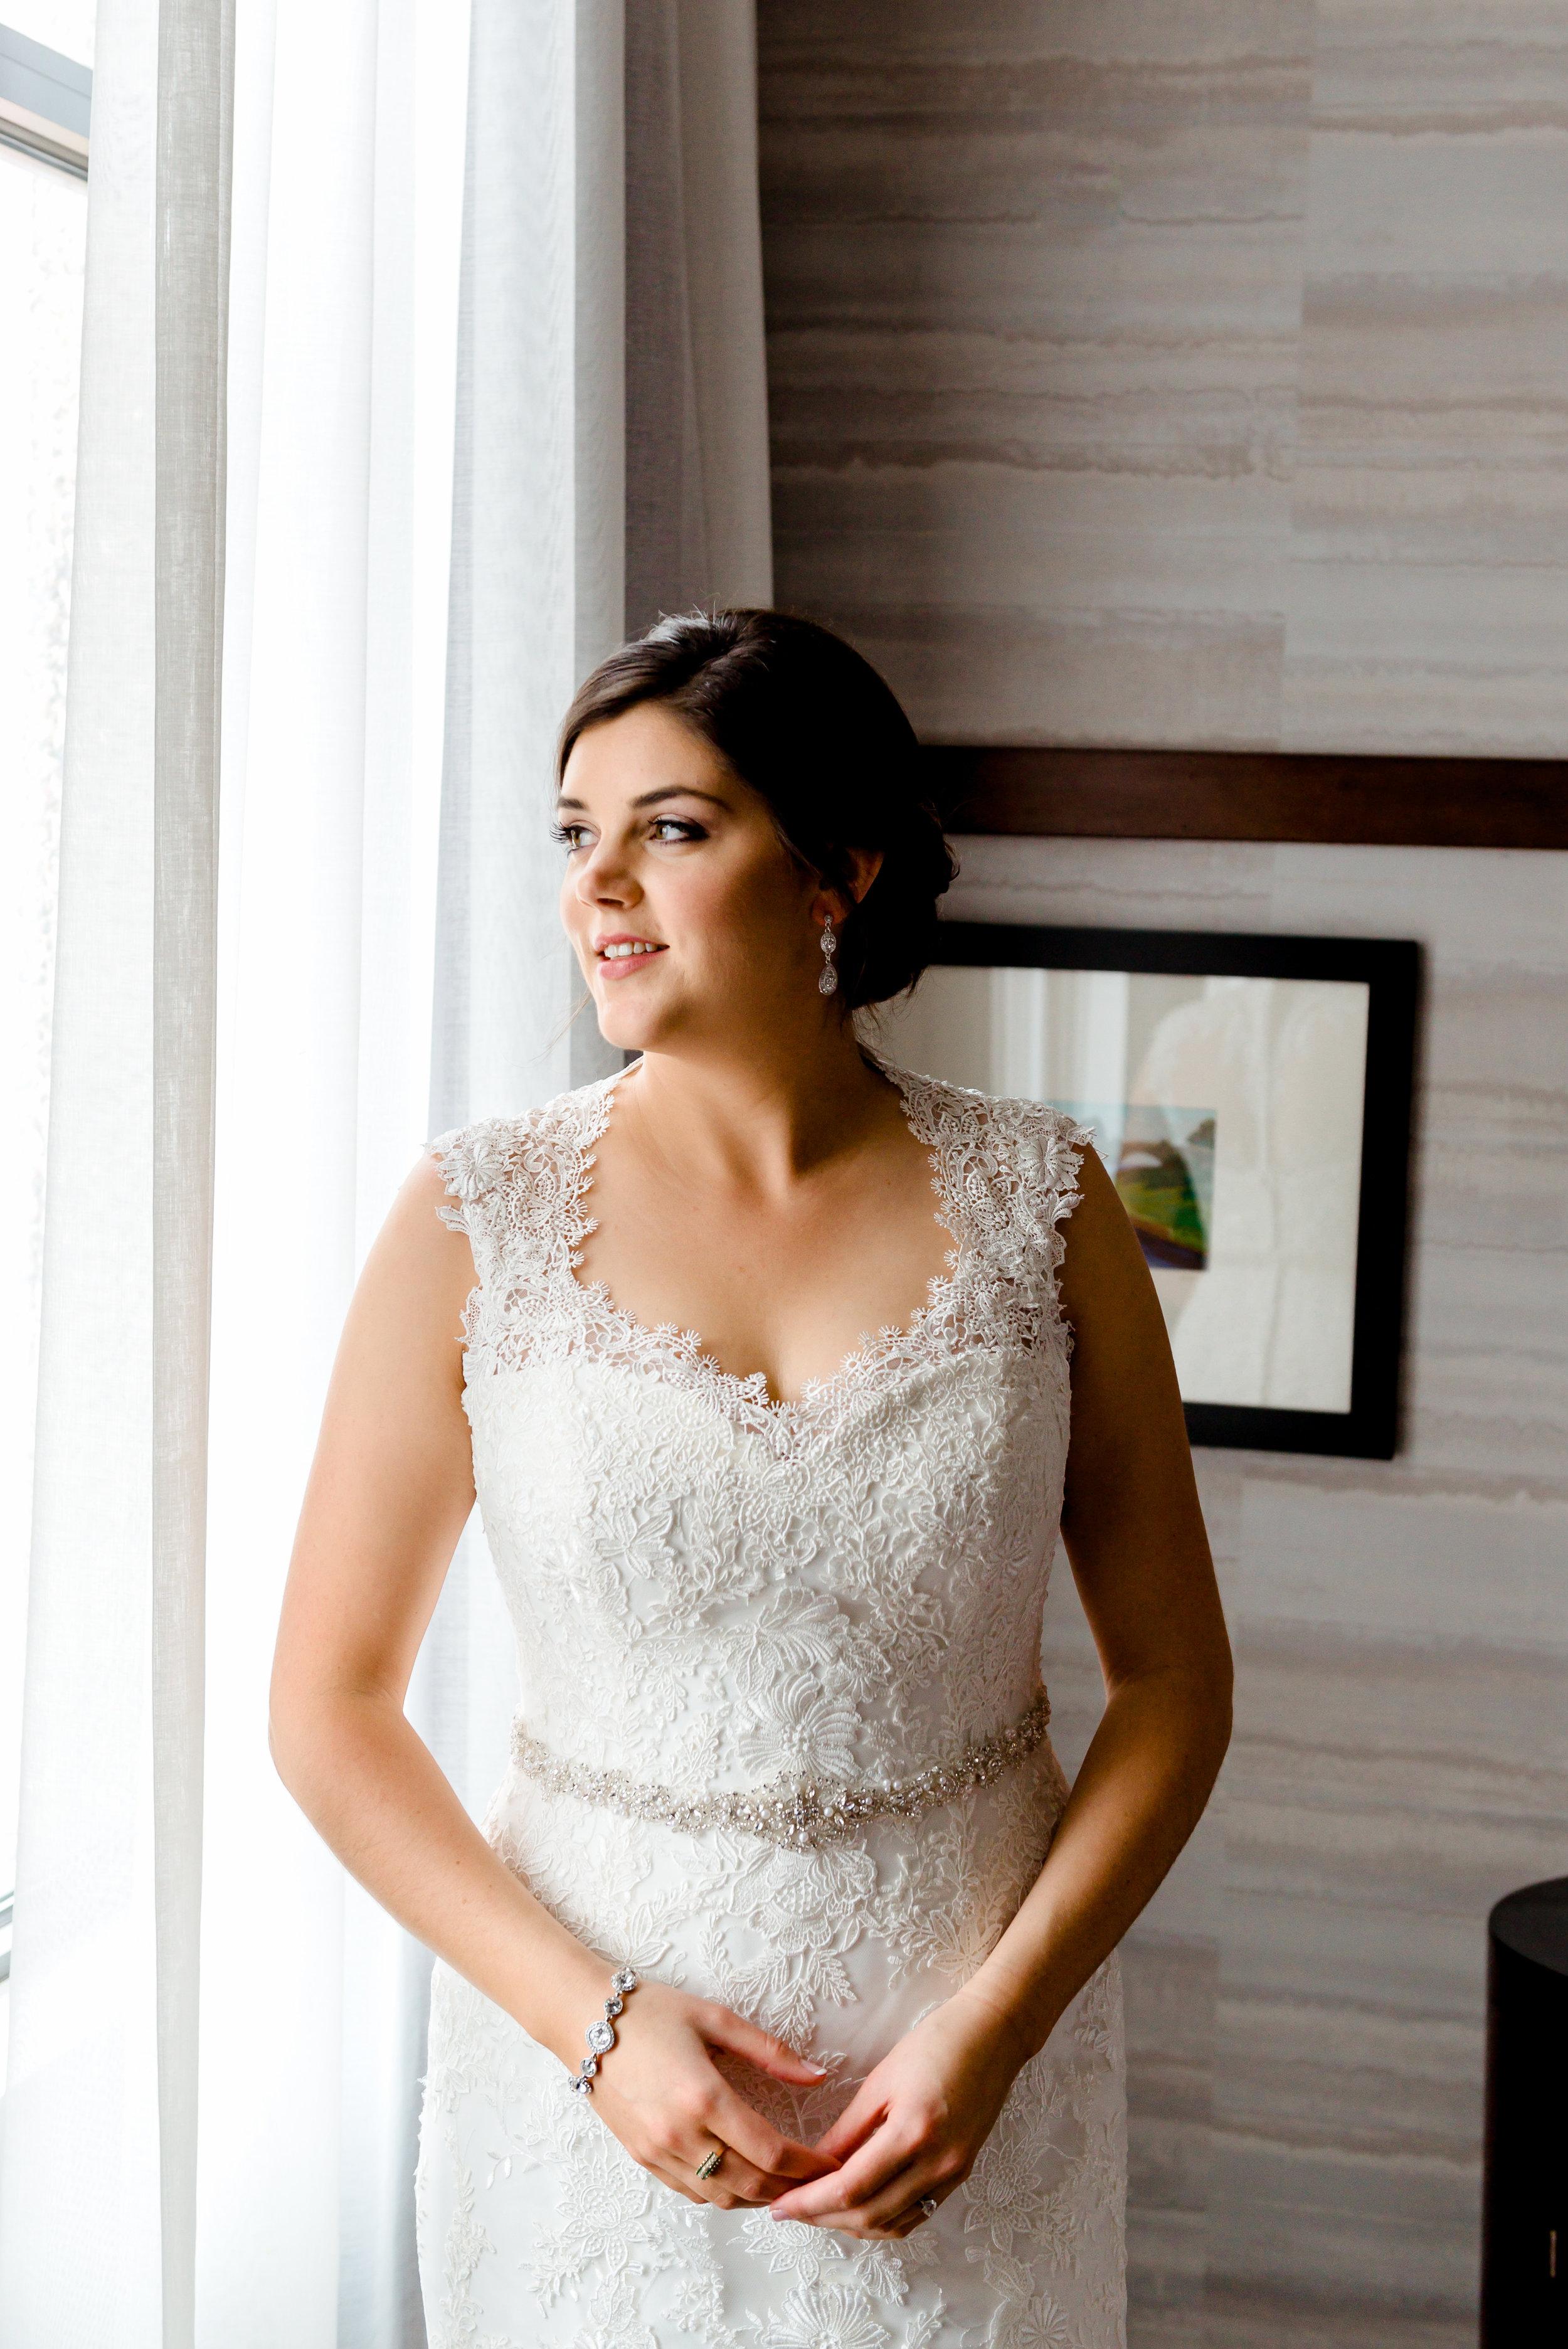 Hotel Ivy Wedding - Romantic Bridal Portraits with Window Light - Minneapolis Luxury Wedding Photographer